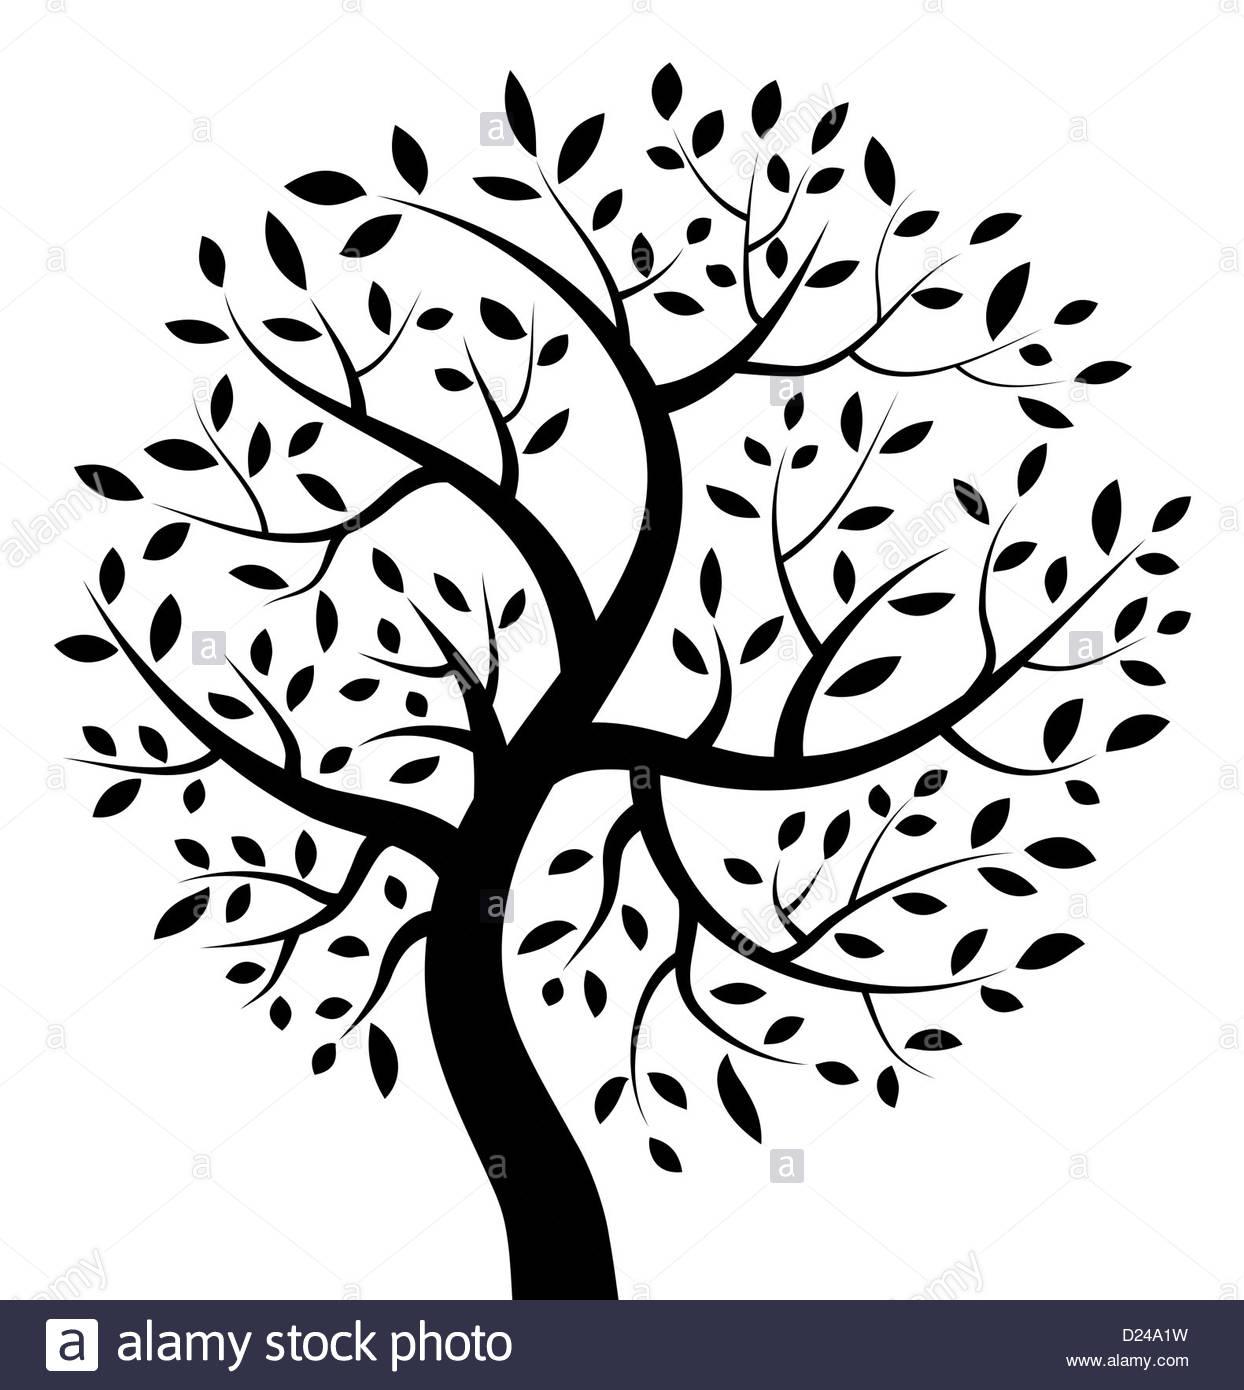 1244x1390 Family Tree Illustration Black And White Stock Photos Amp Images